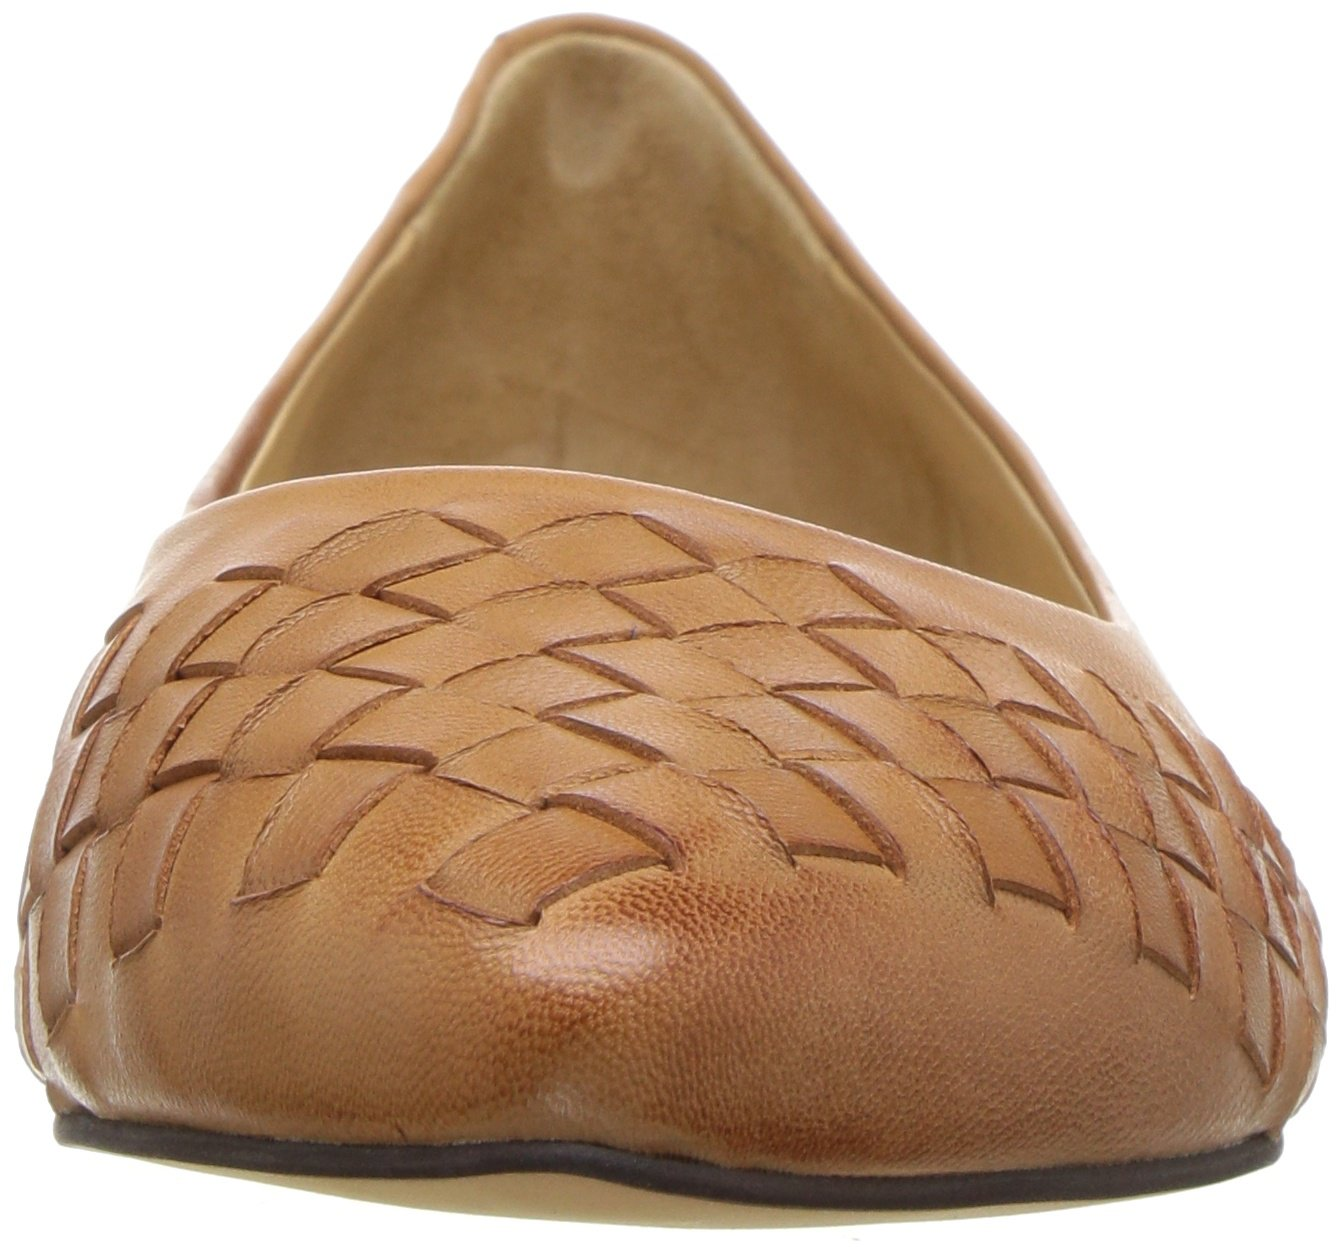 Trotters Women's Estee Woven Ballet US|Tan Flat B01NGYR9AR 7.5 N US|Tan Ballet 41e823